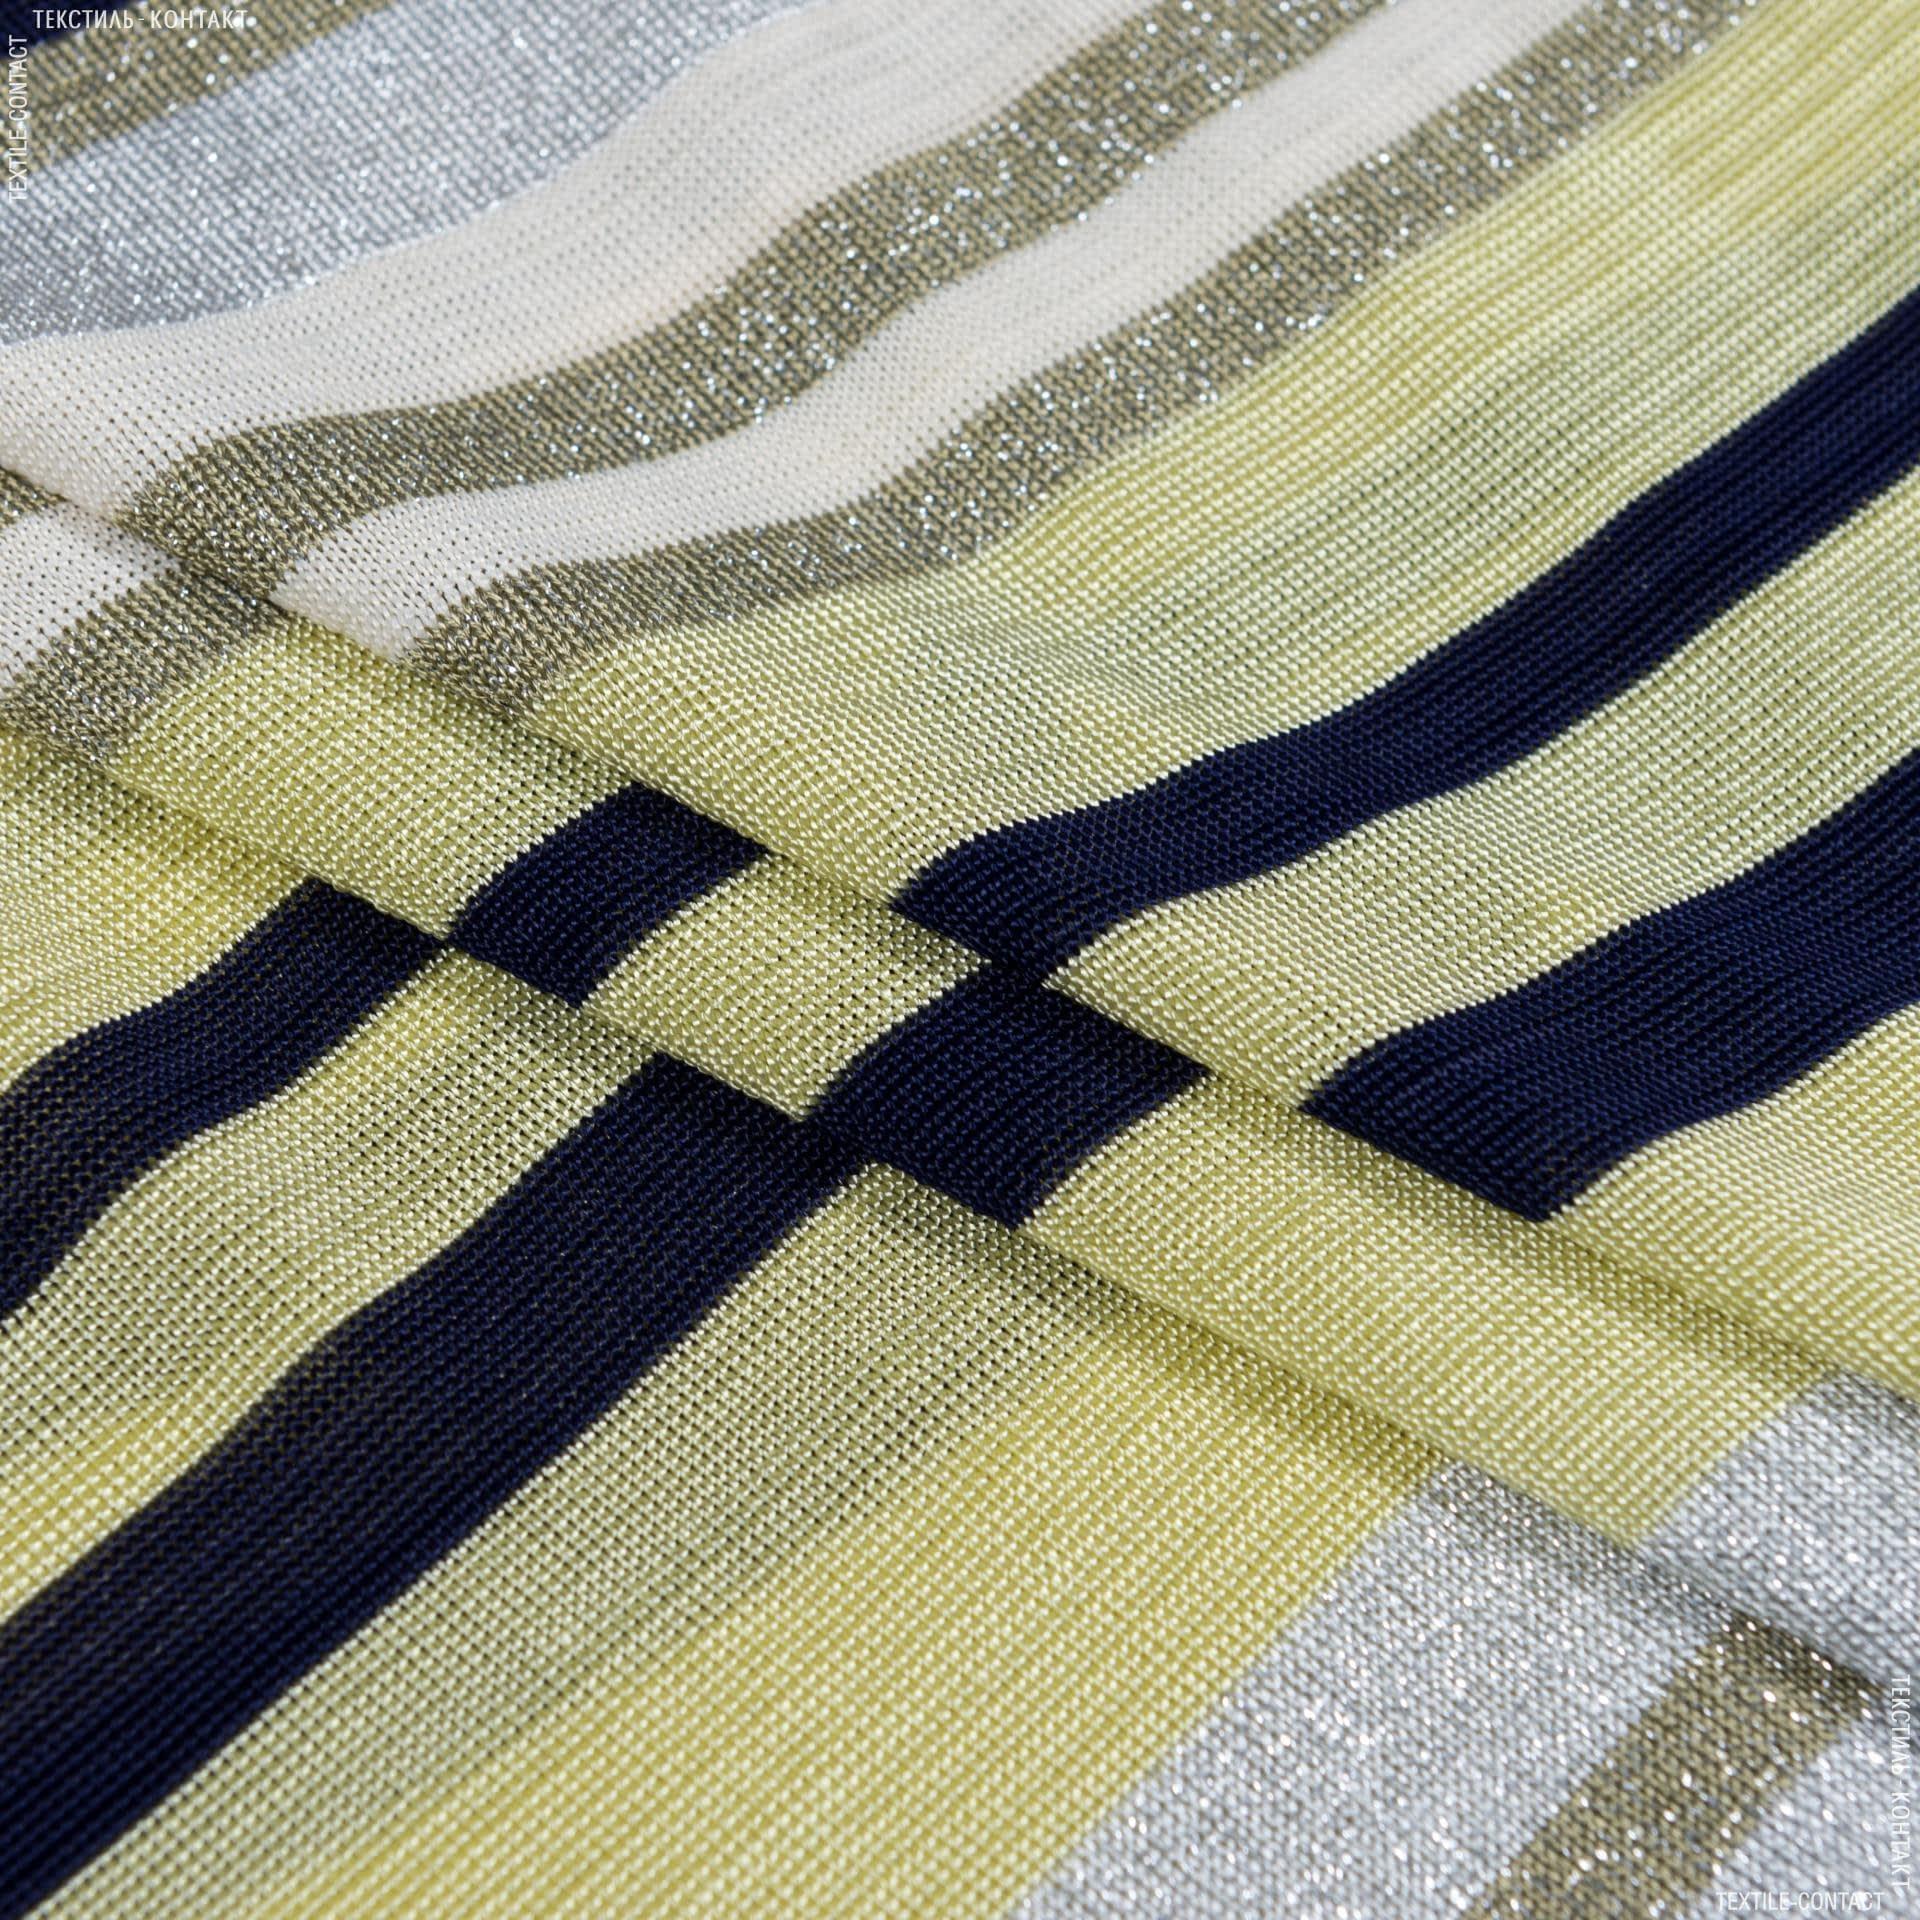 Тканини для суконь - Трикотаж mikonos з люрексом